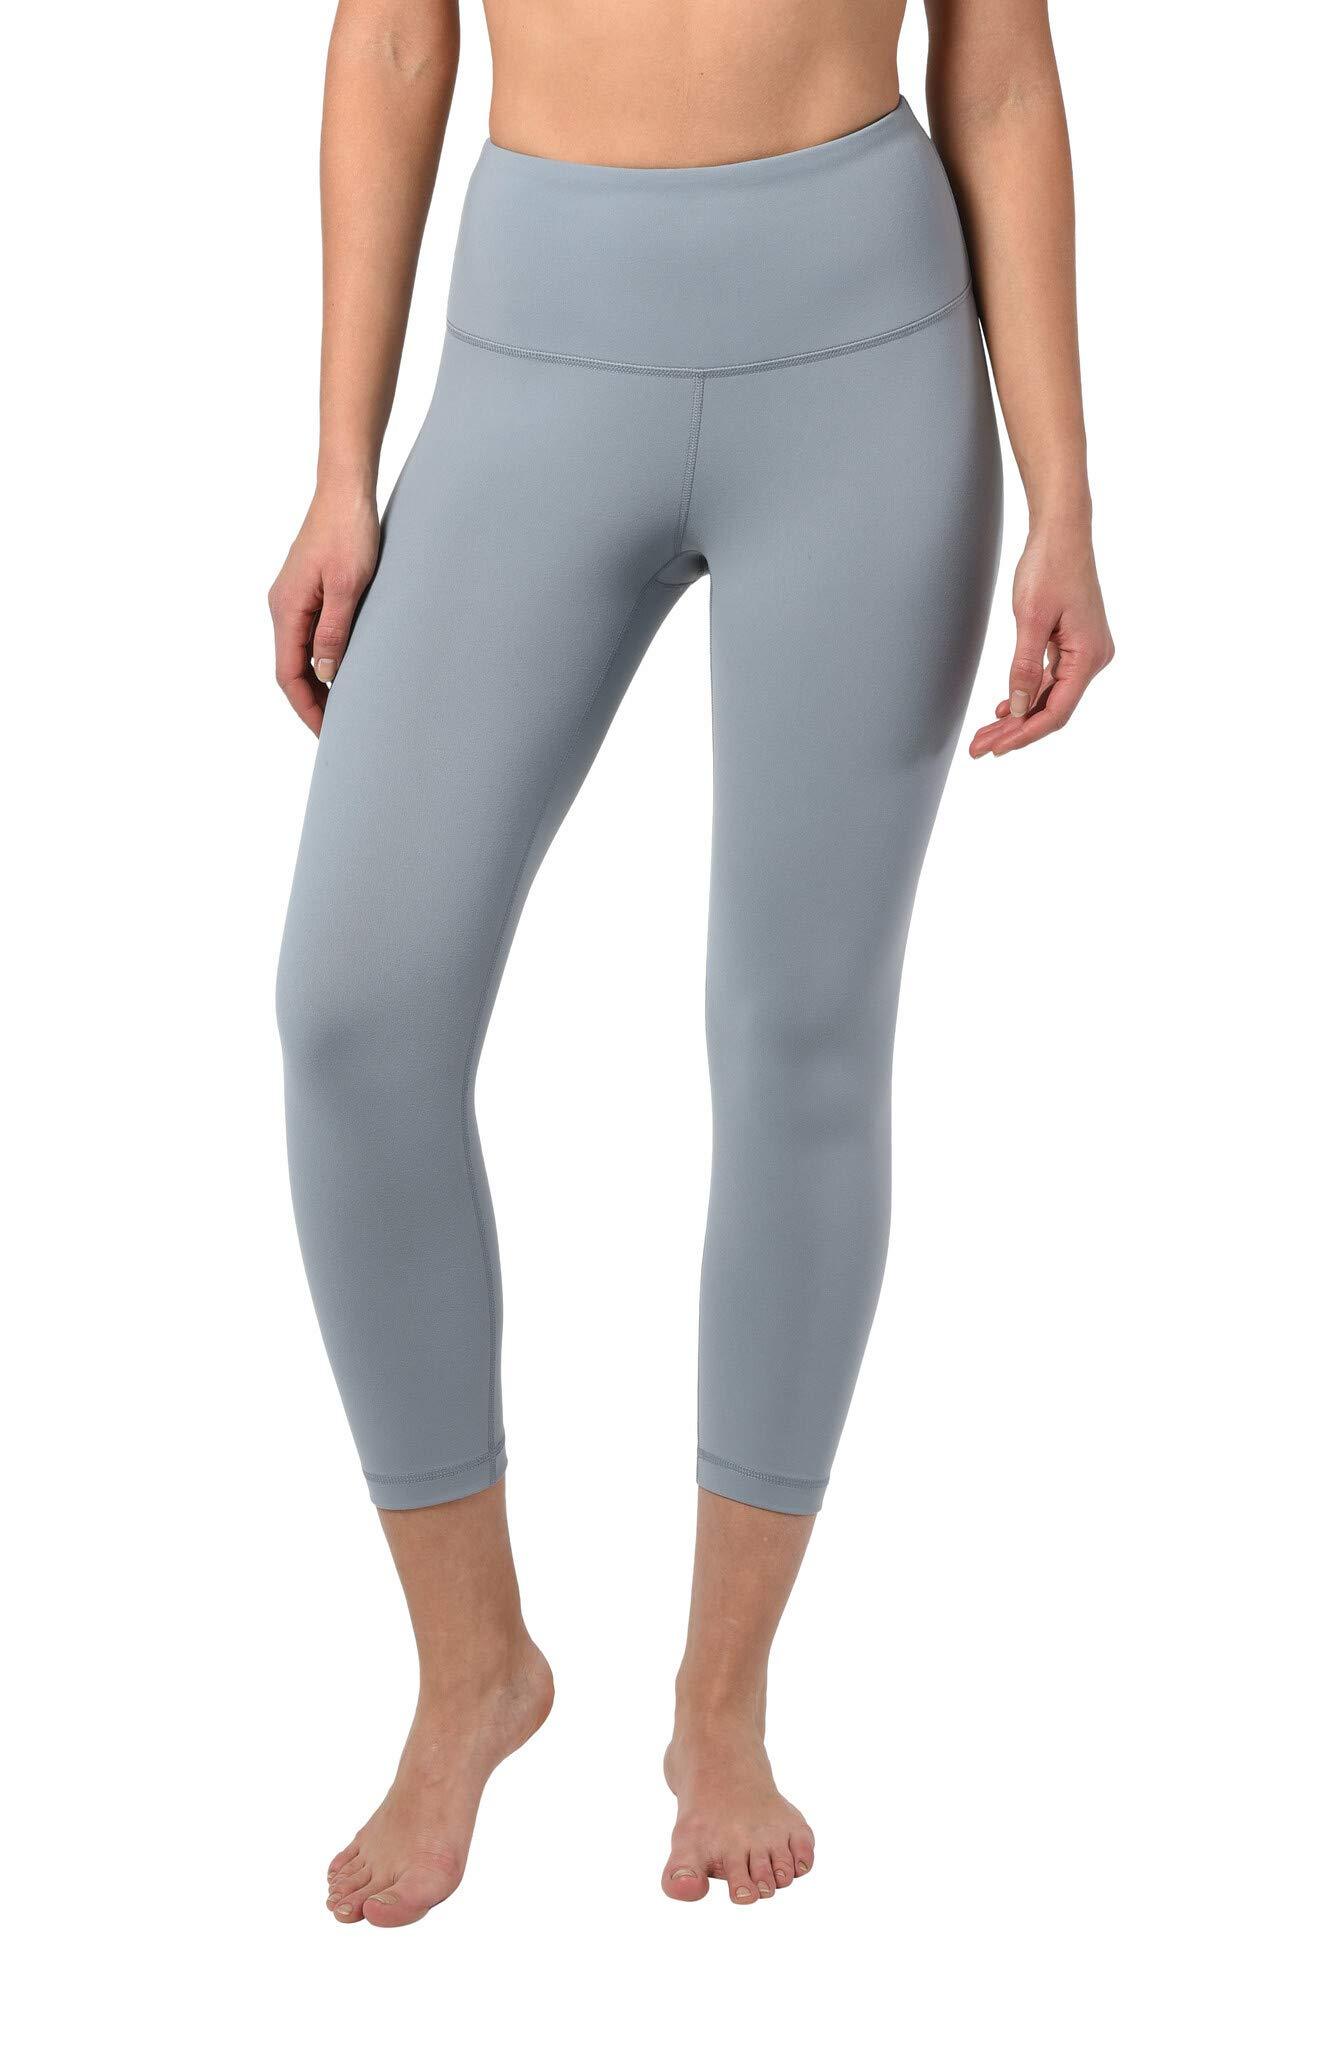 90 Degree By Reflex - High Waist Tummy Control Shapewear - Power Flex Capri - Skylight - Small by 90 Degree By Reflex